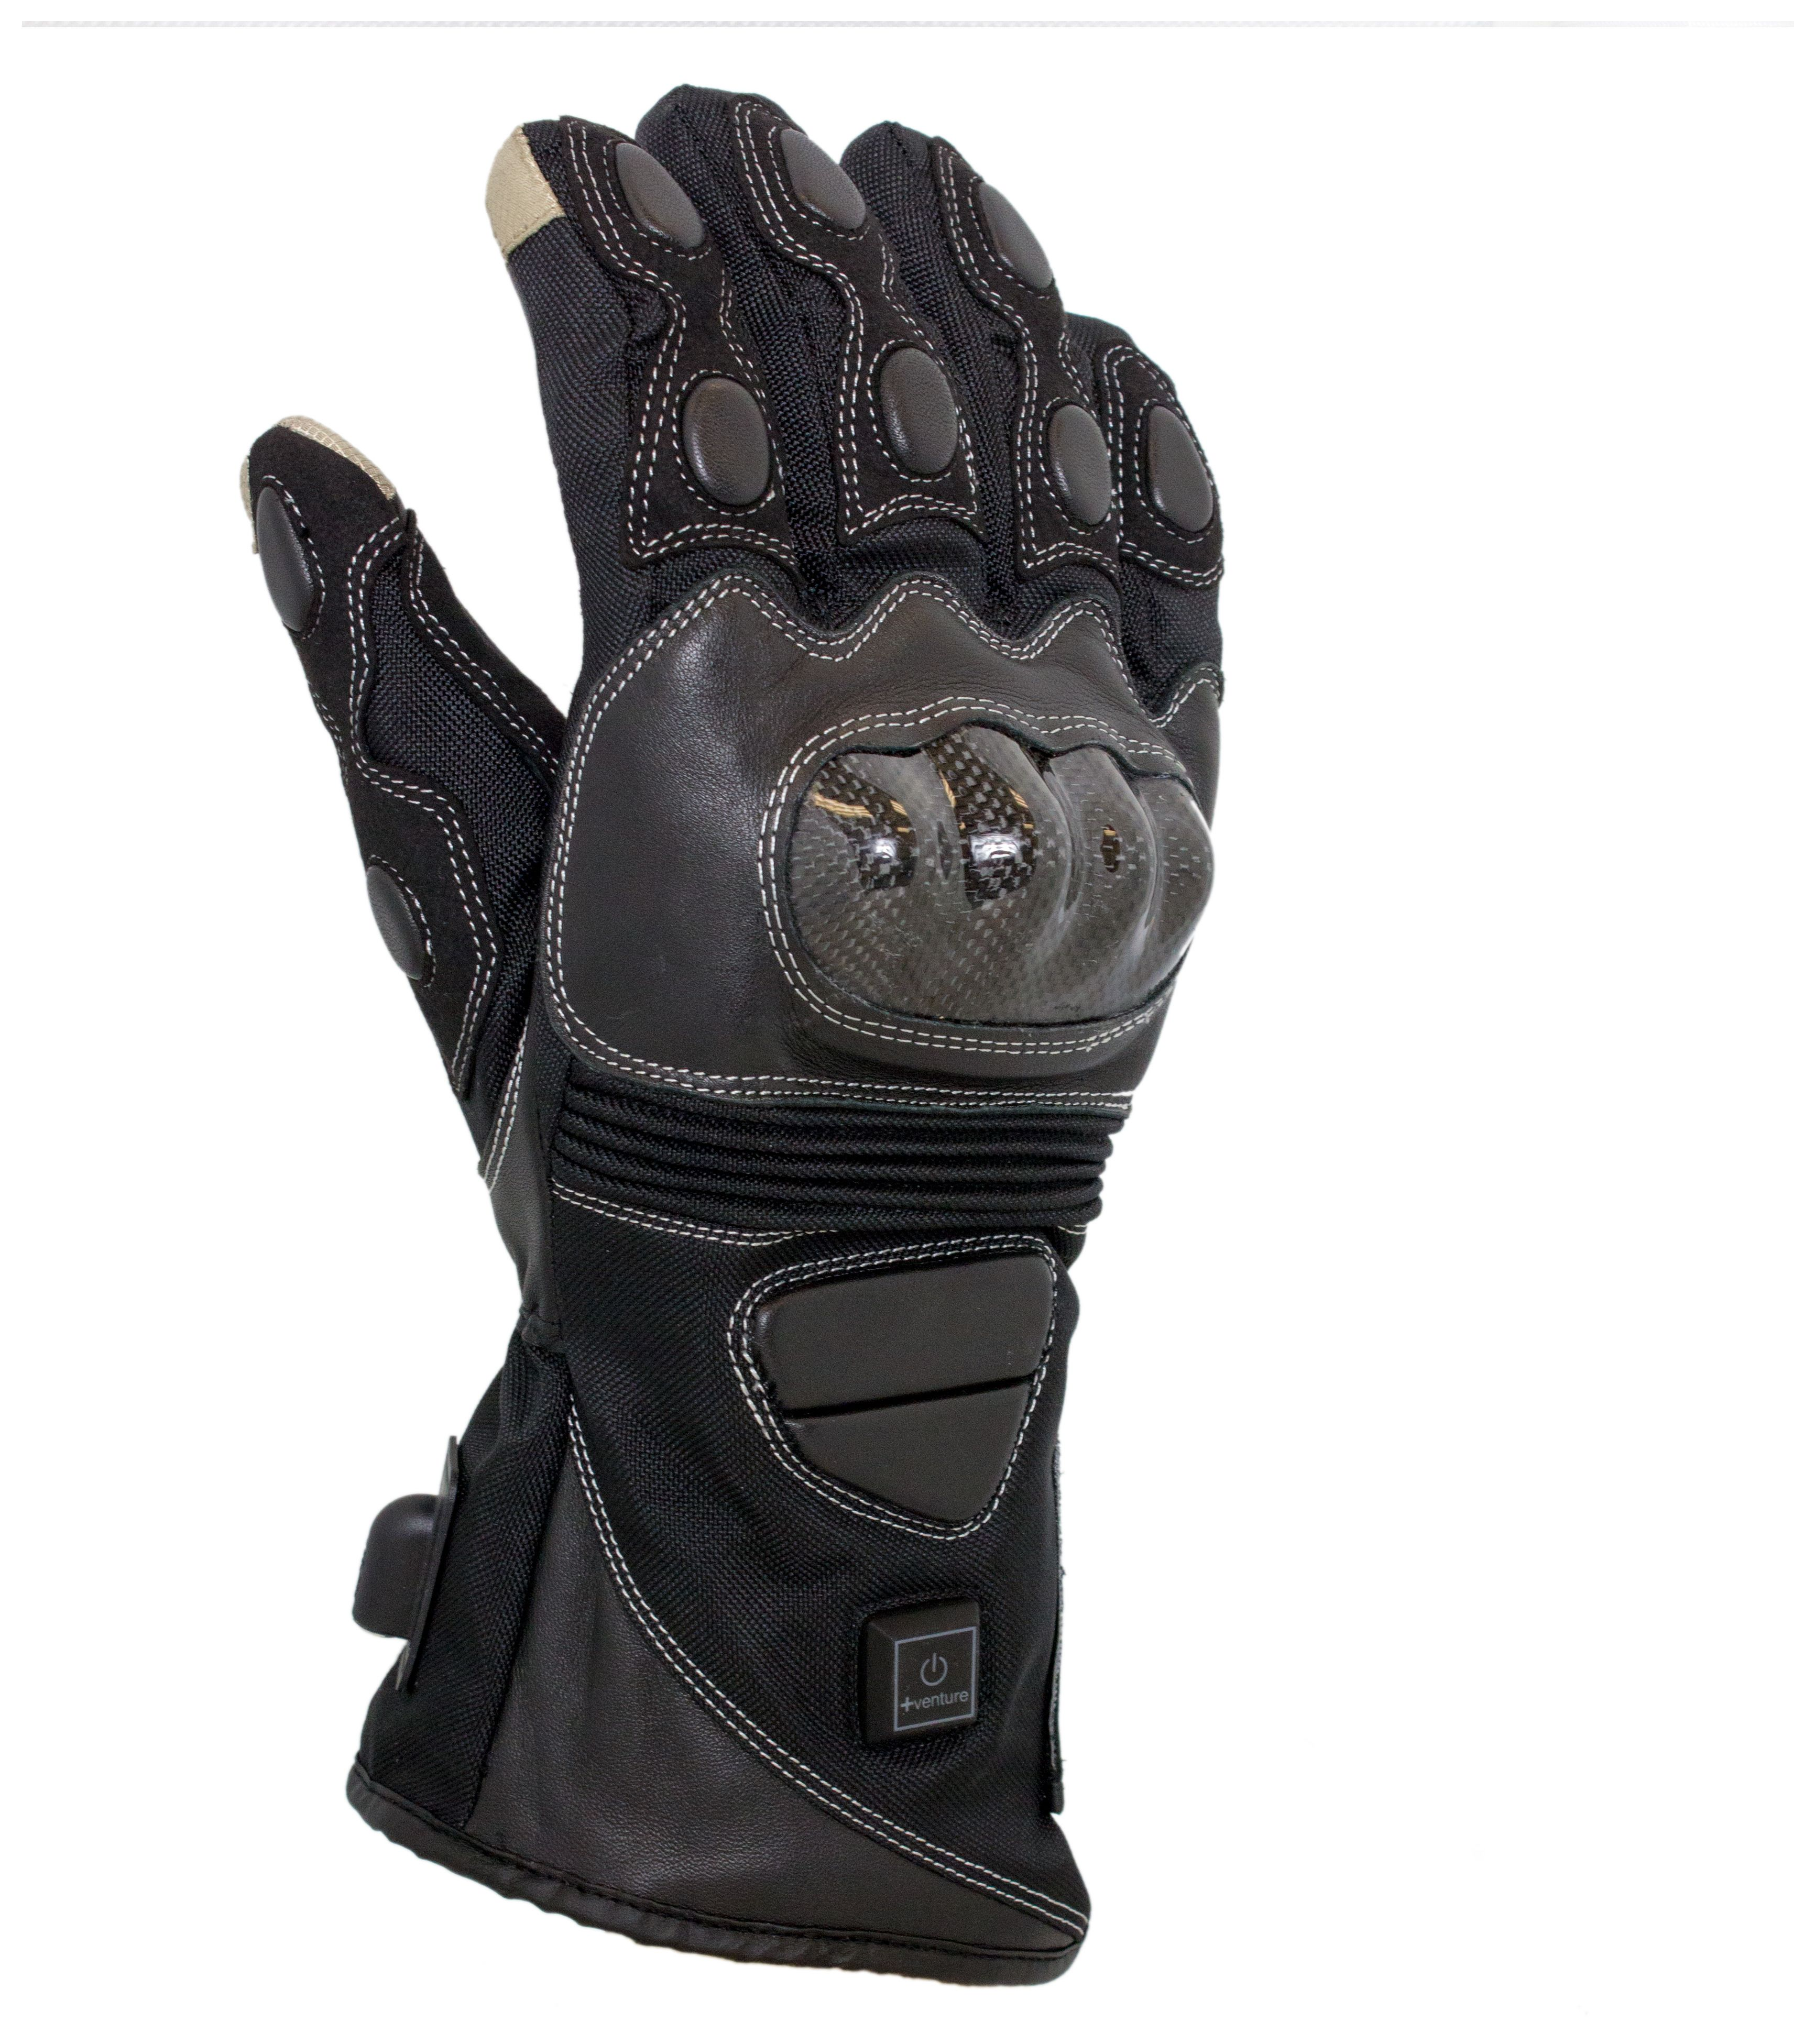 Motorcycle gloves ottawa - Motorcycle Gloves Ottawa 19